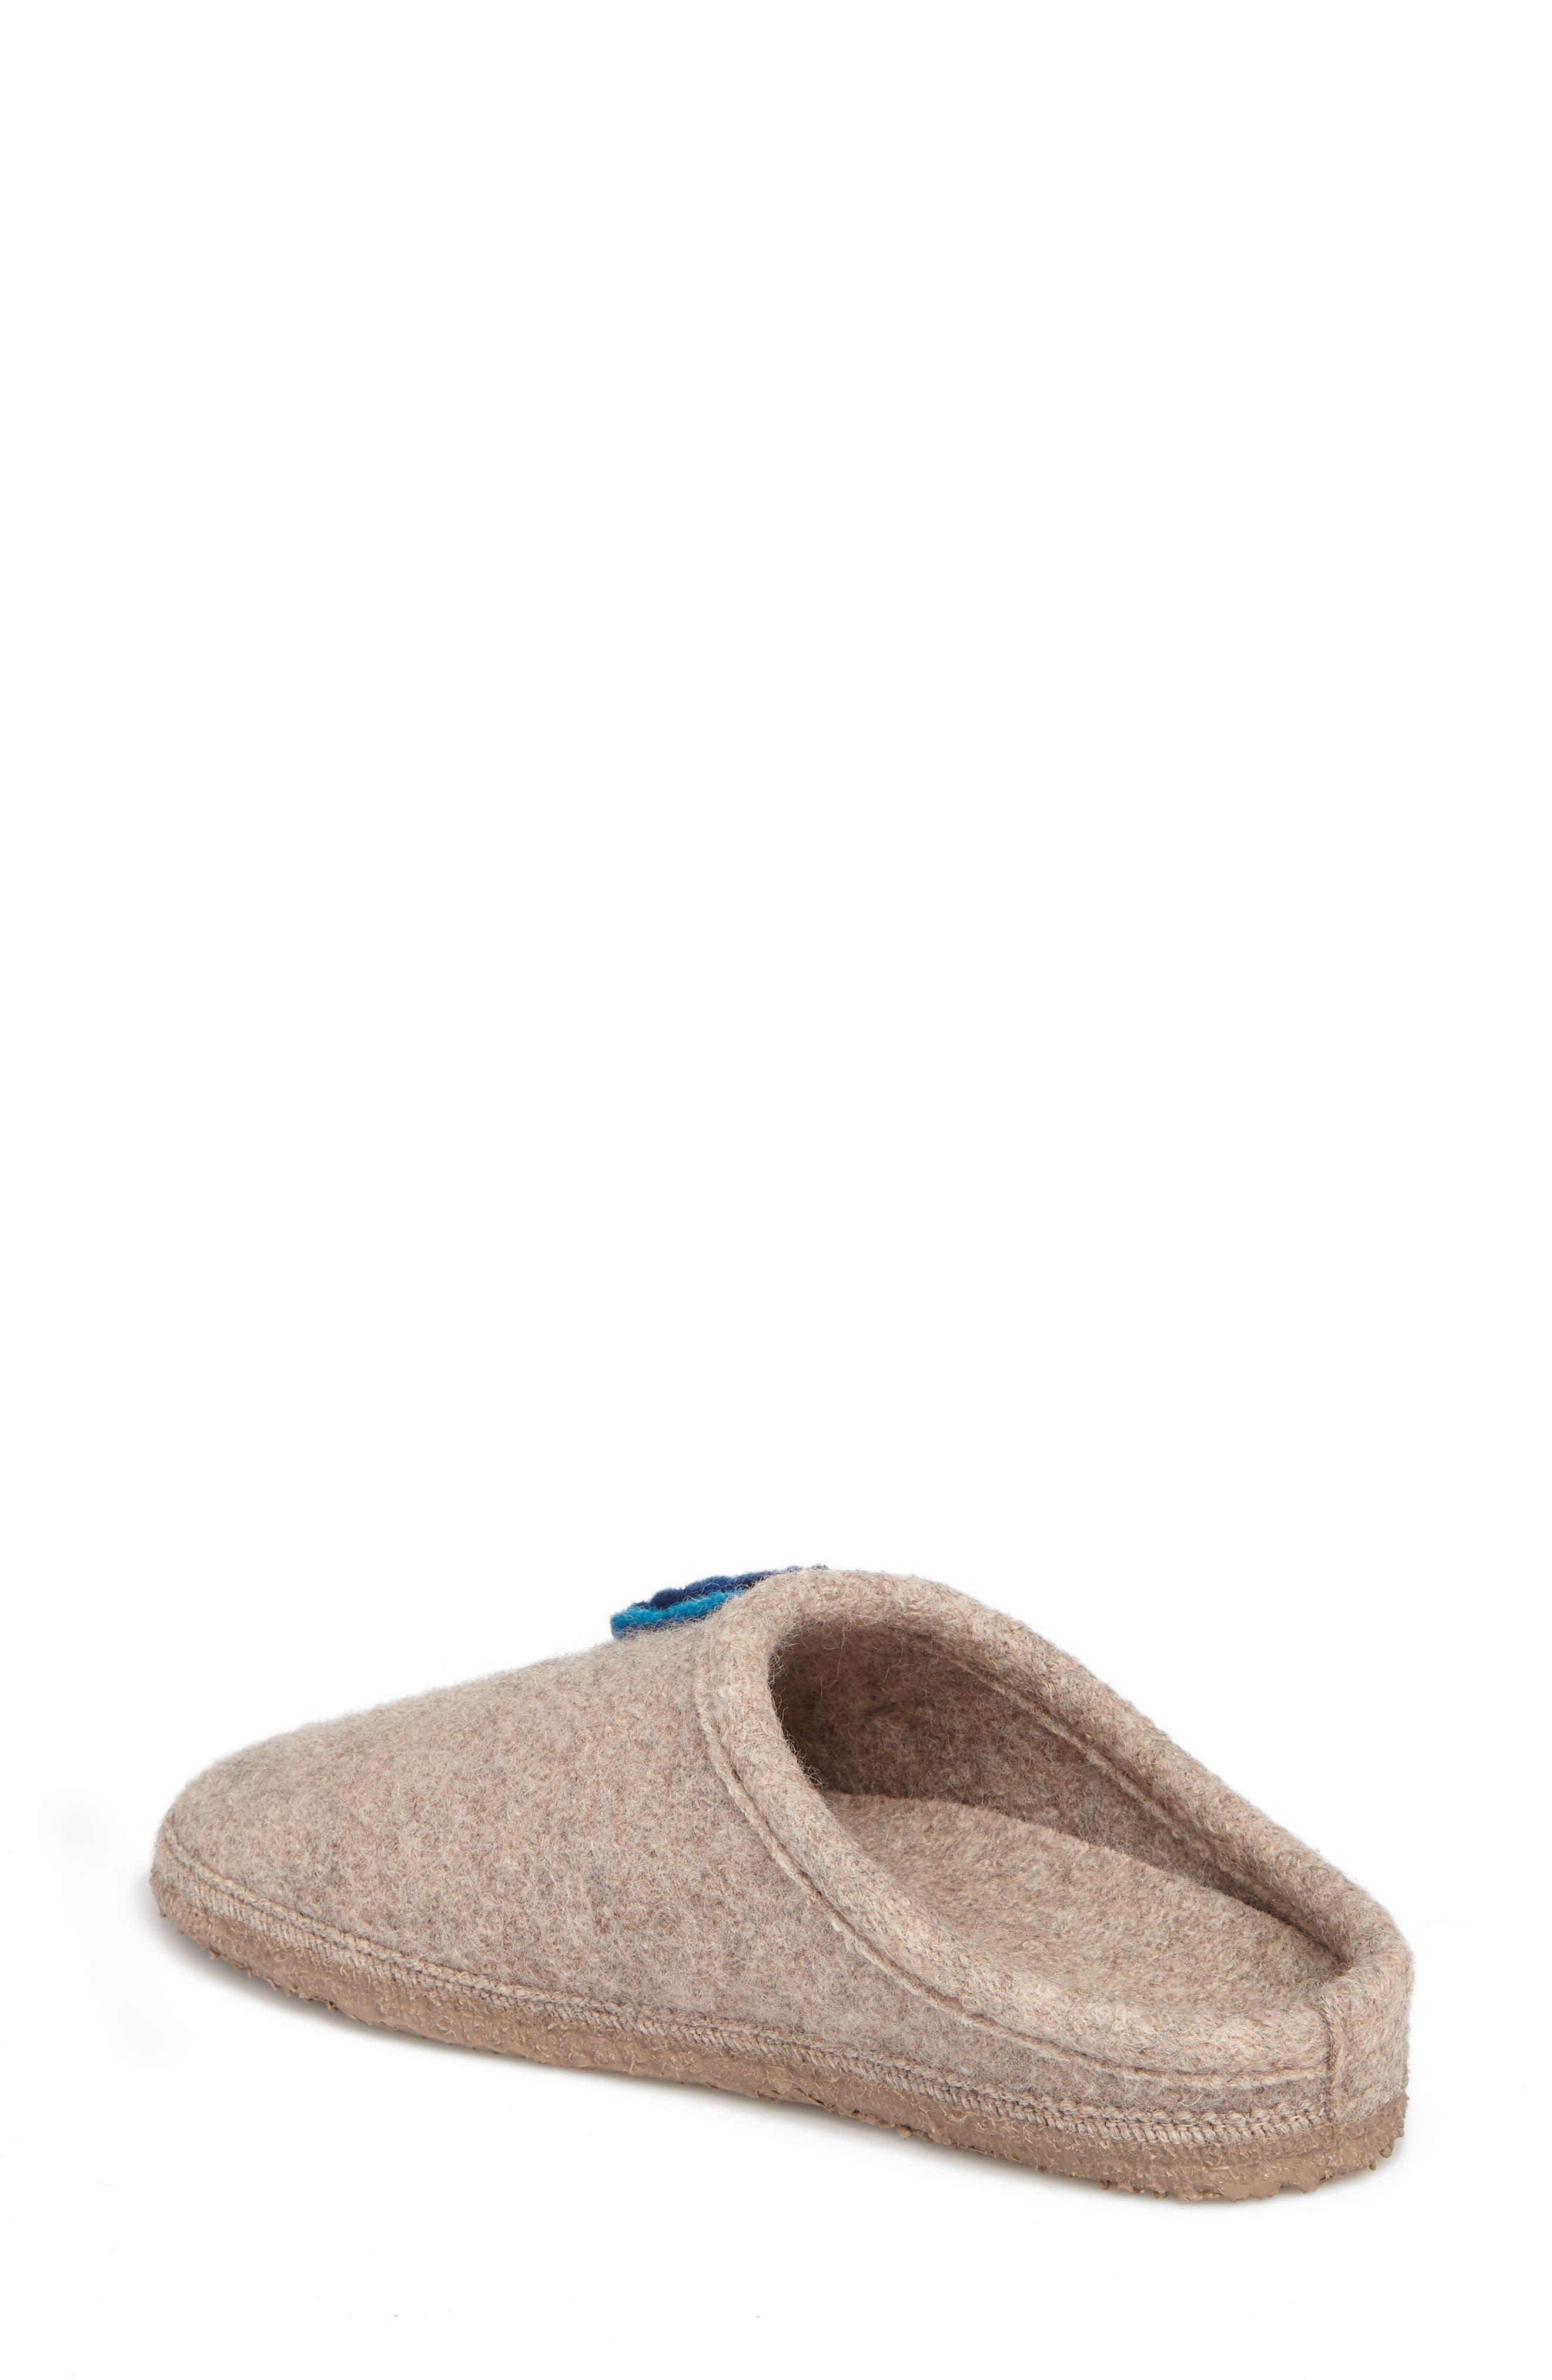 Georgie Indoor Boiled Wool Slipper,                             Alternate thumbnail 2, color,                             NATURAL WOOL